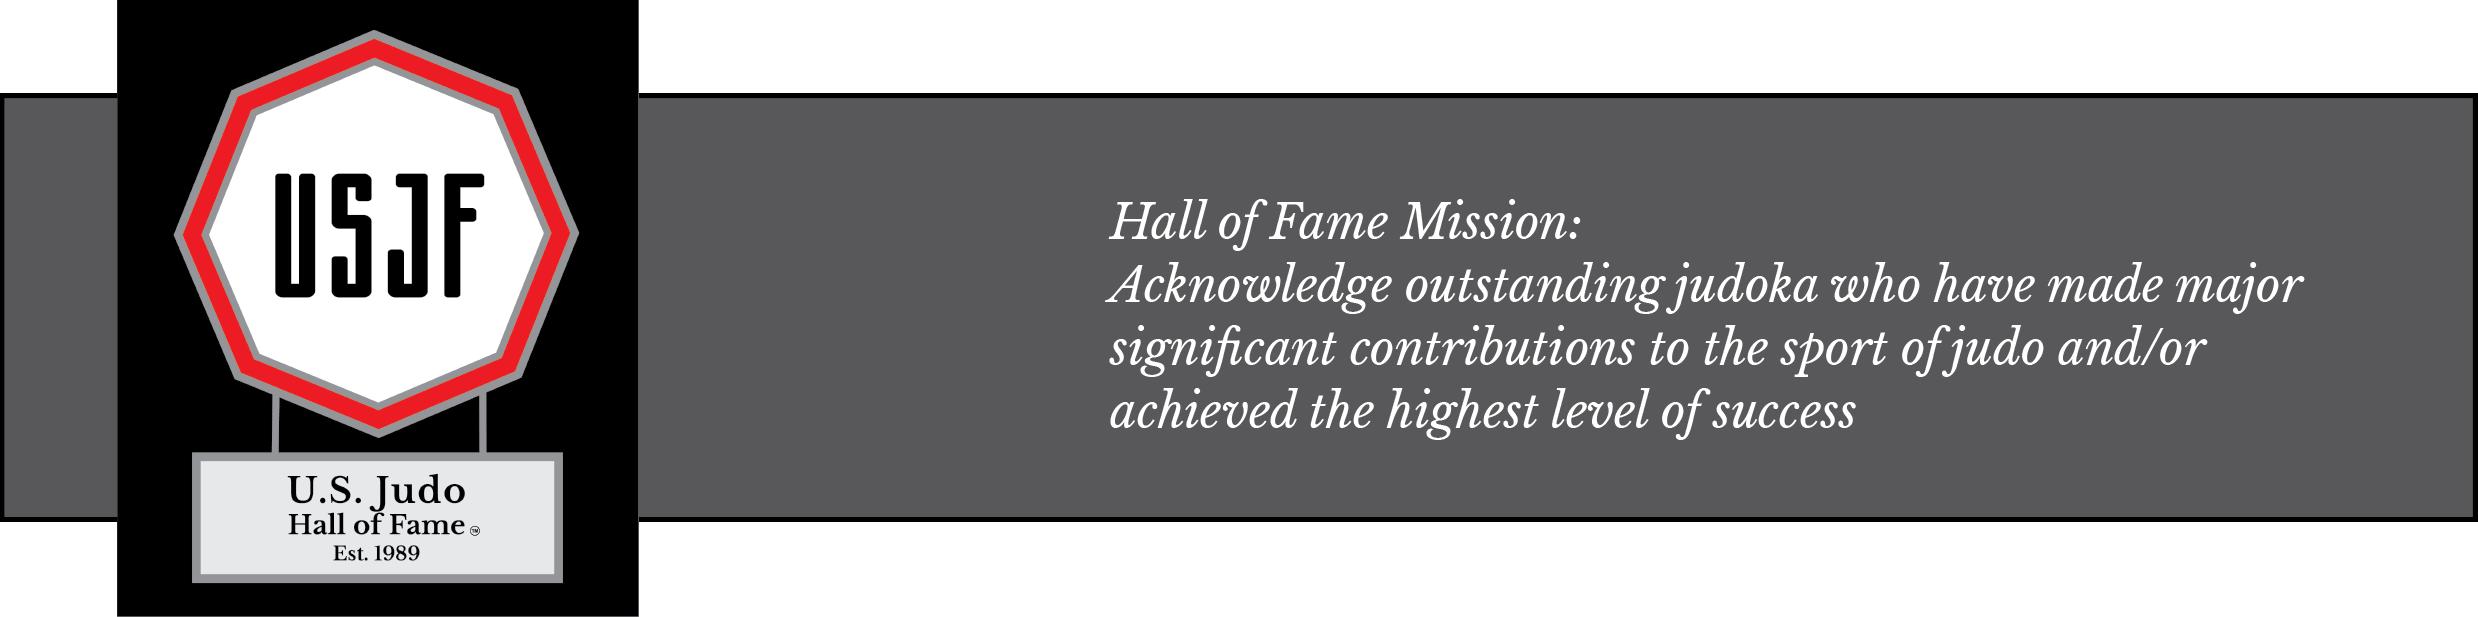 US JUdo Hall of Fame logo